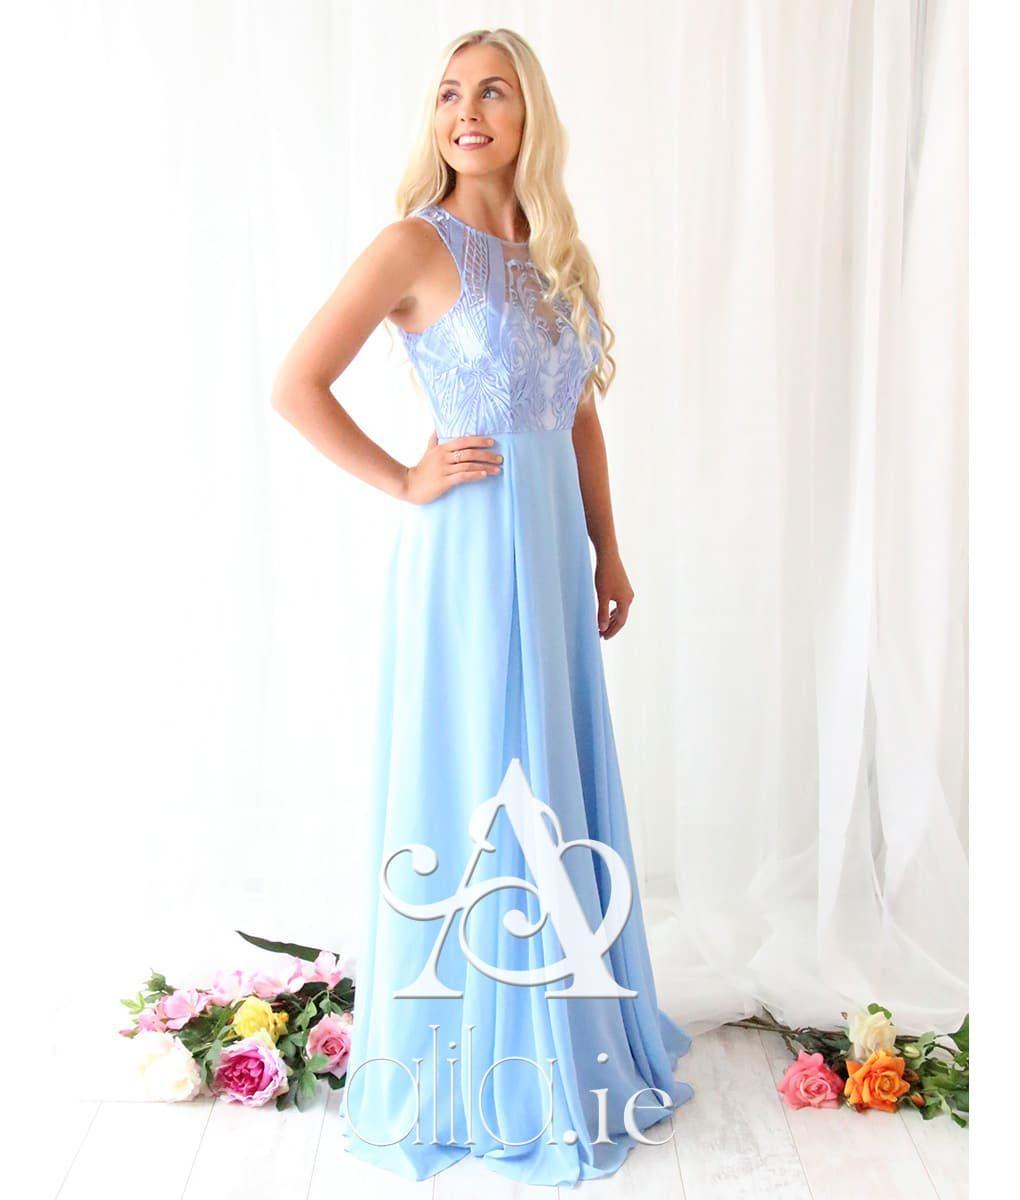 Alila sky blue chiffon lace gown